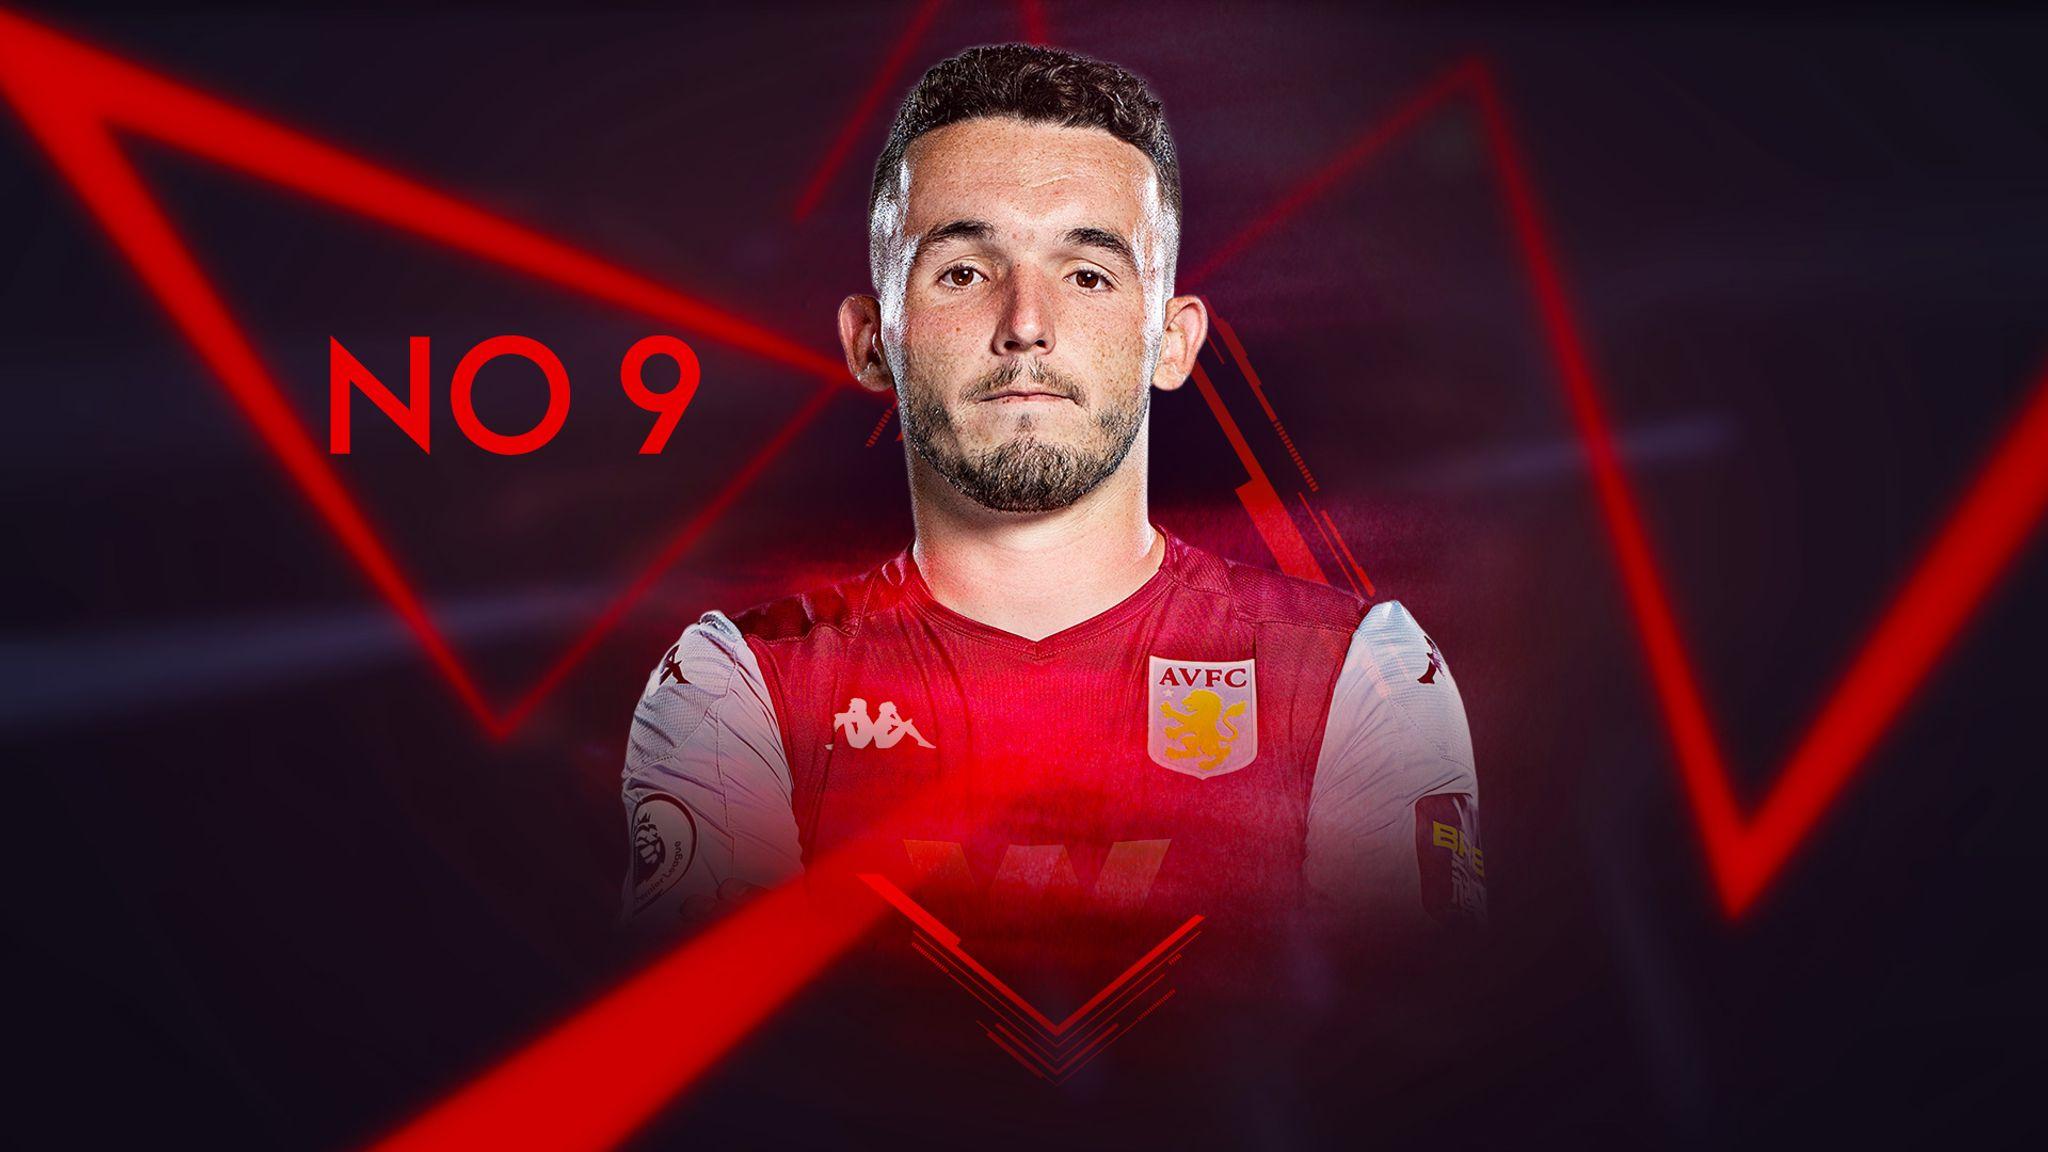 Premier League Power Rankings: Aston Villa's Jack Grealish top